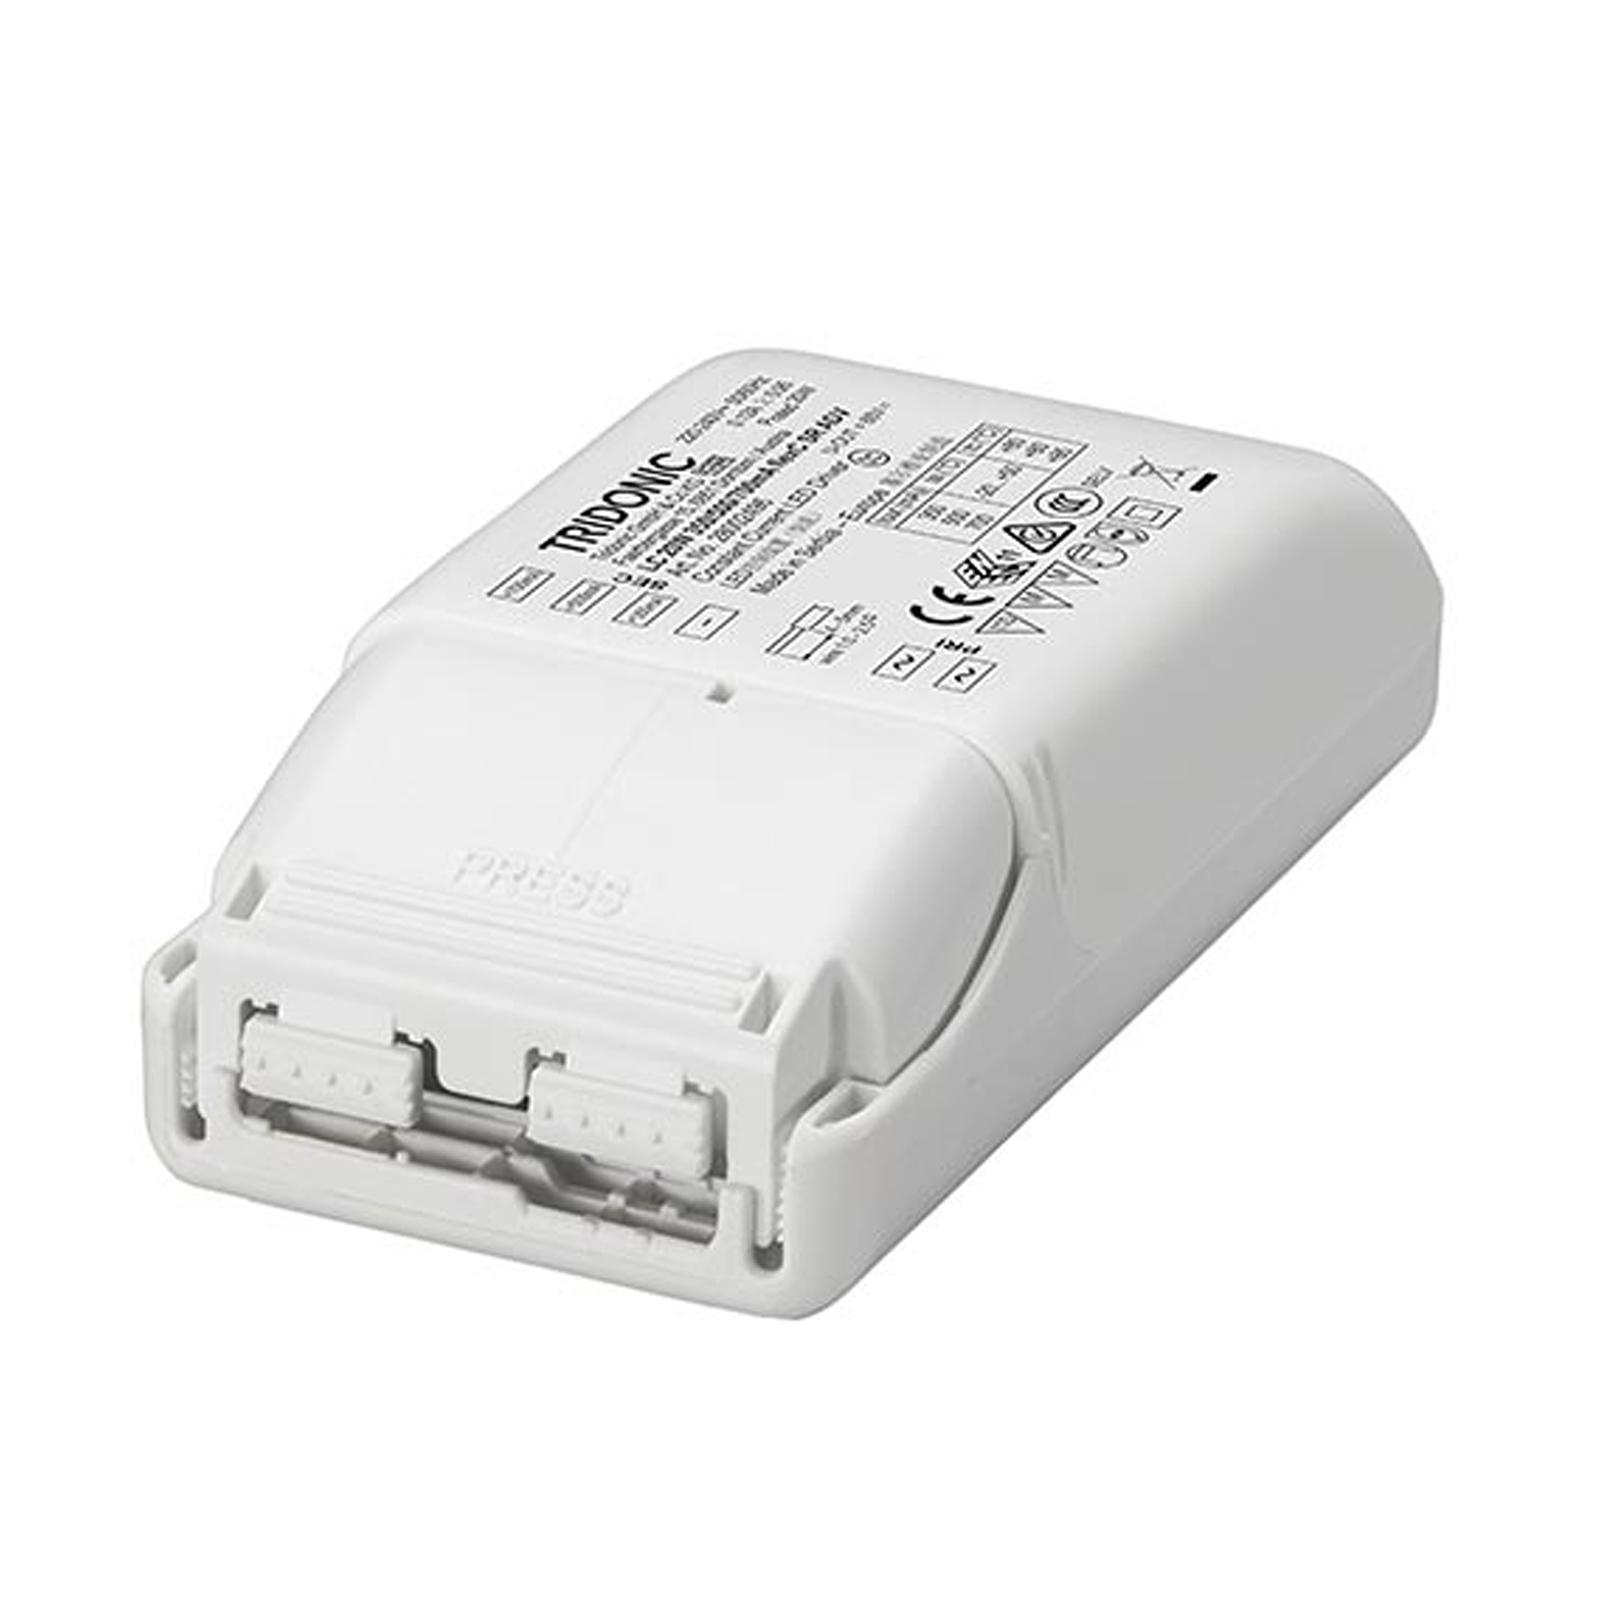 LED-Treiber 6301-04-094 20W on/off